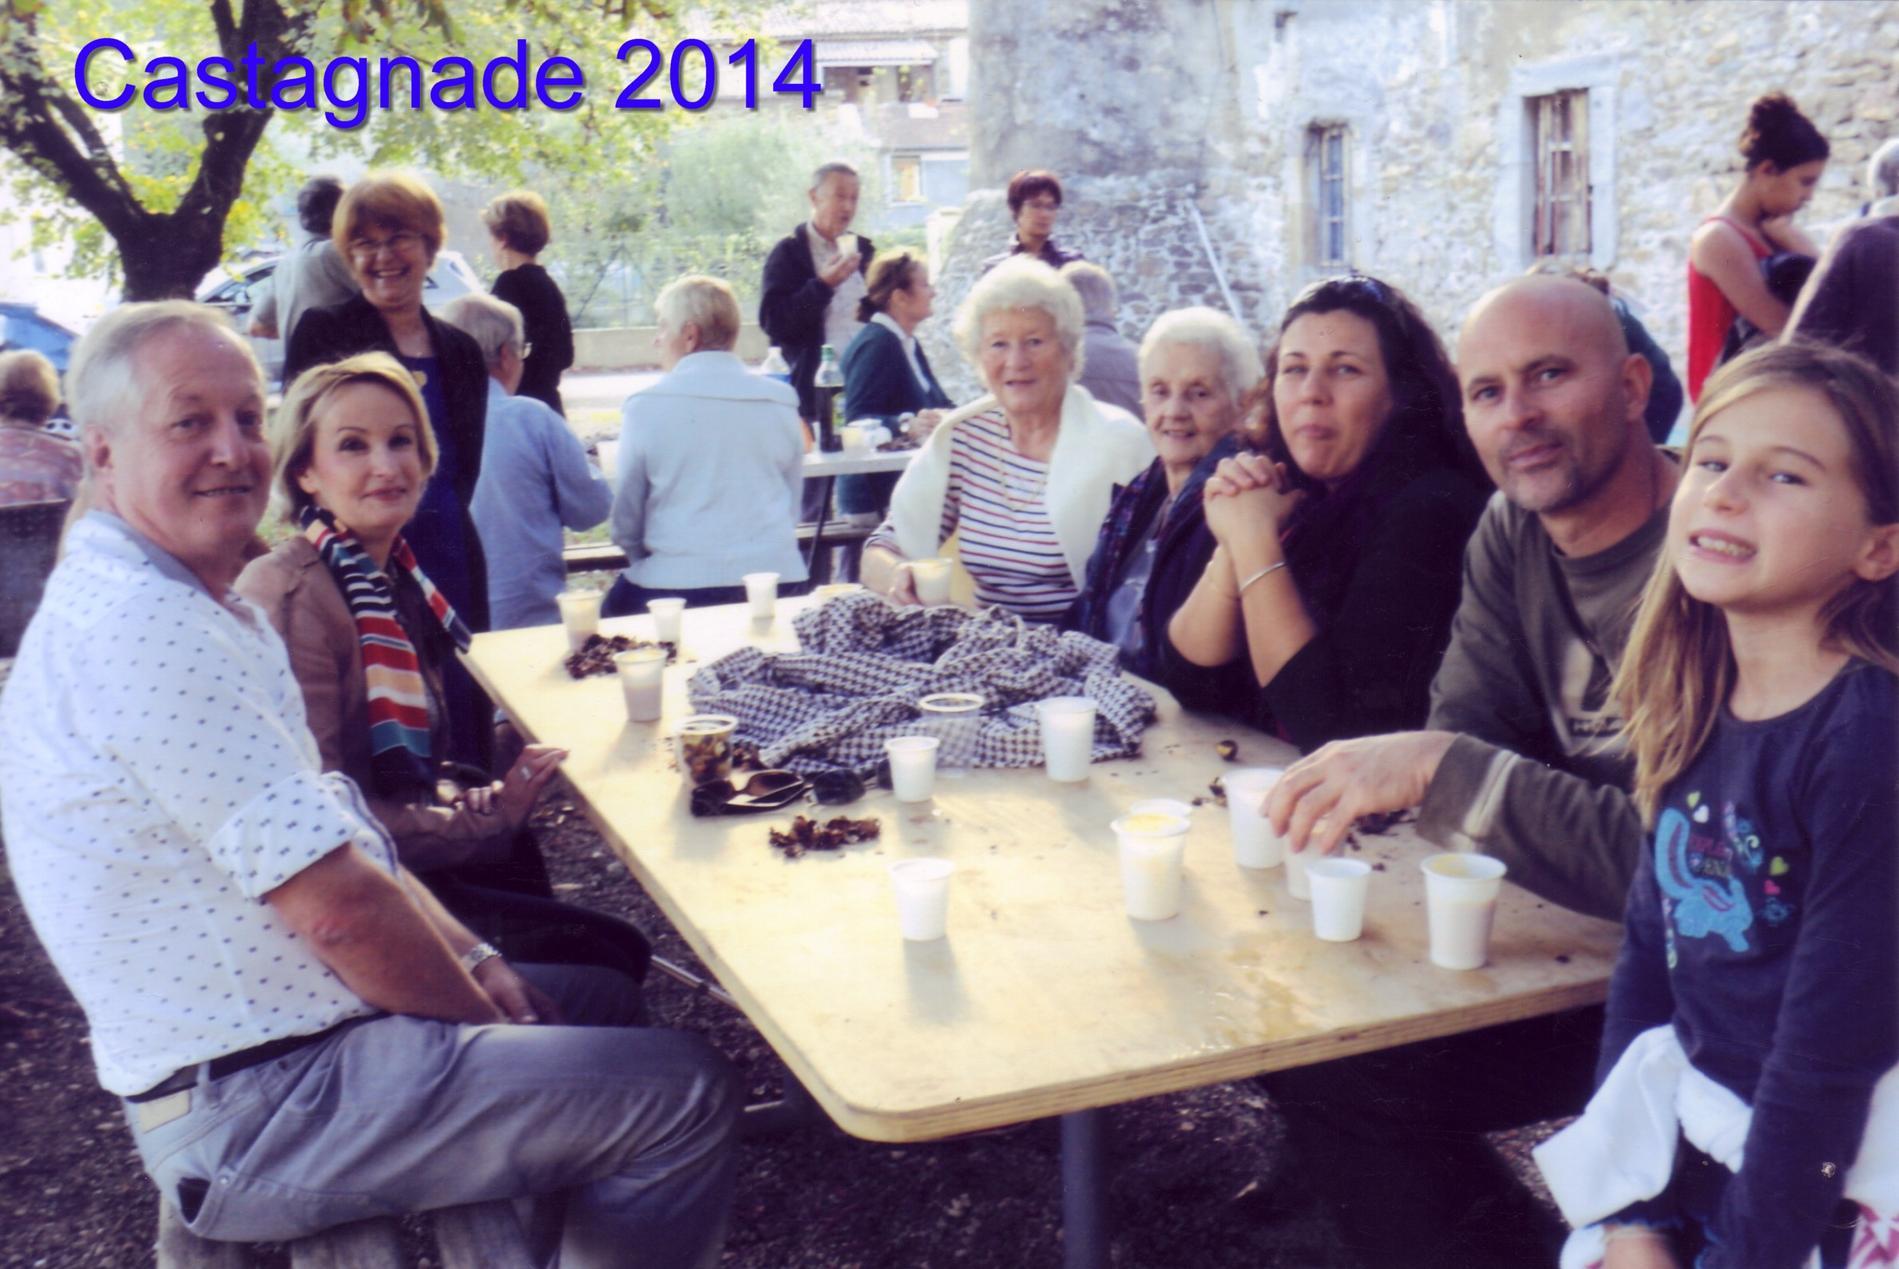 Castagnade 2014 bis